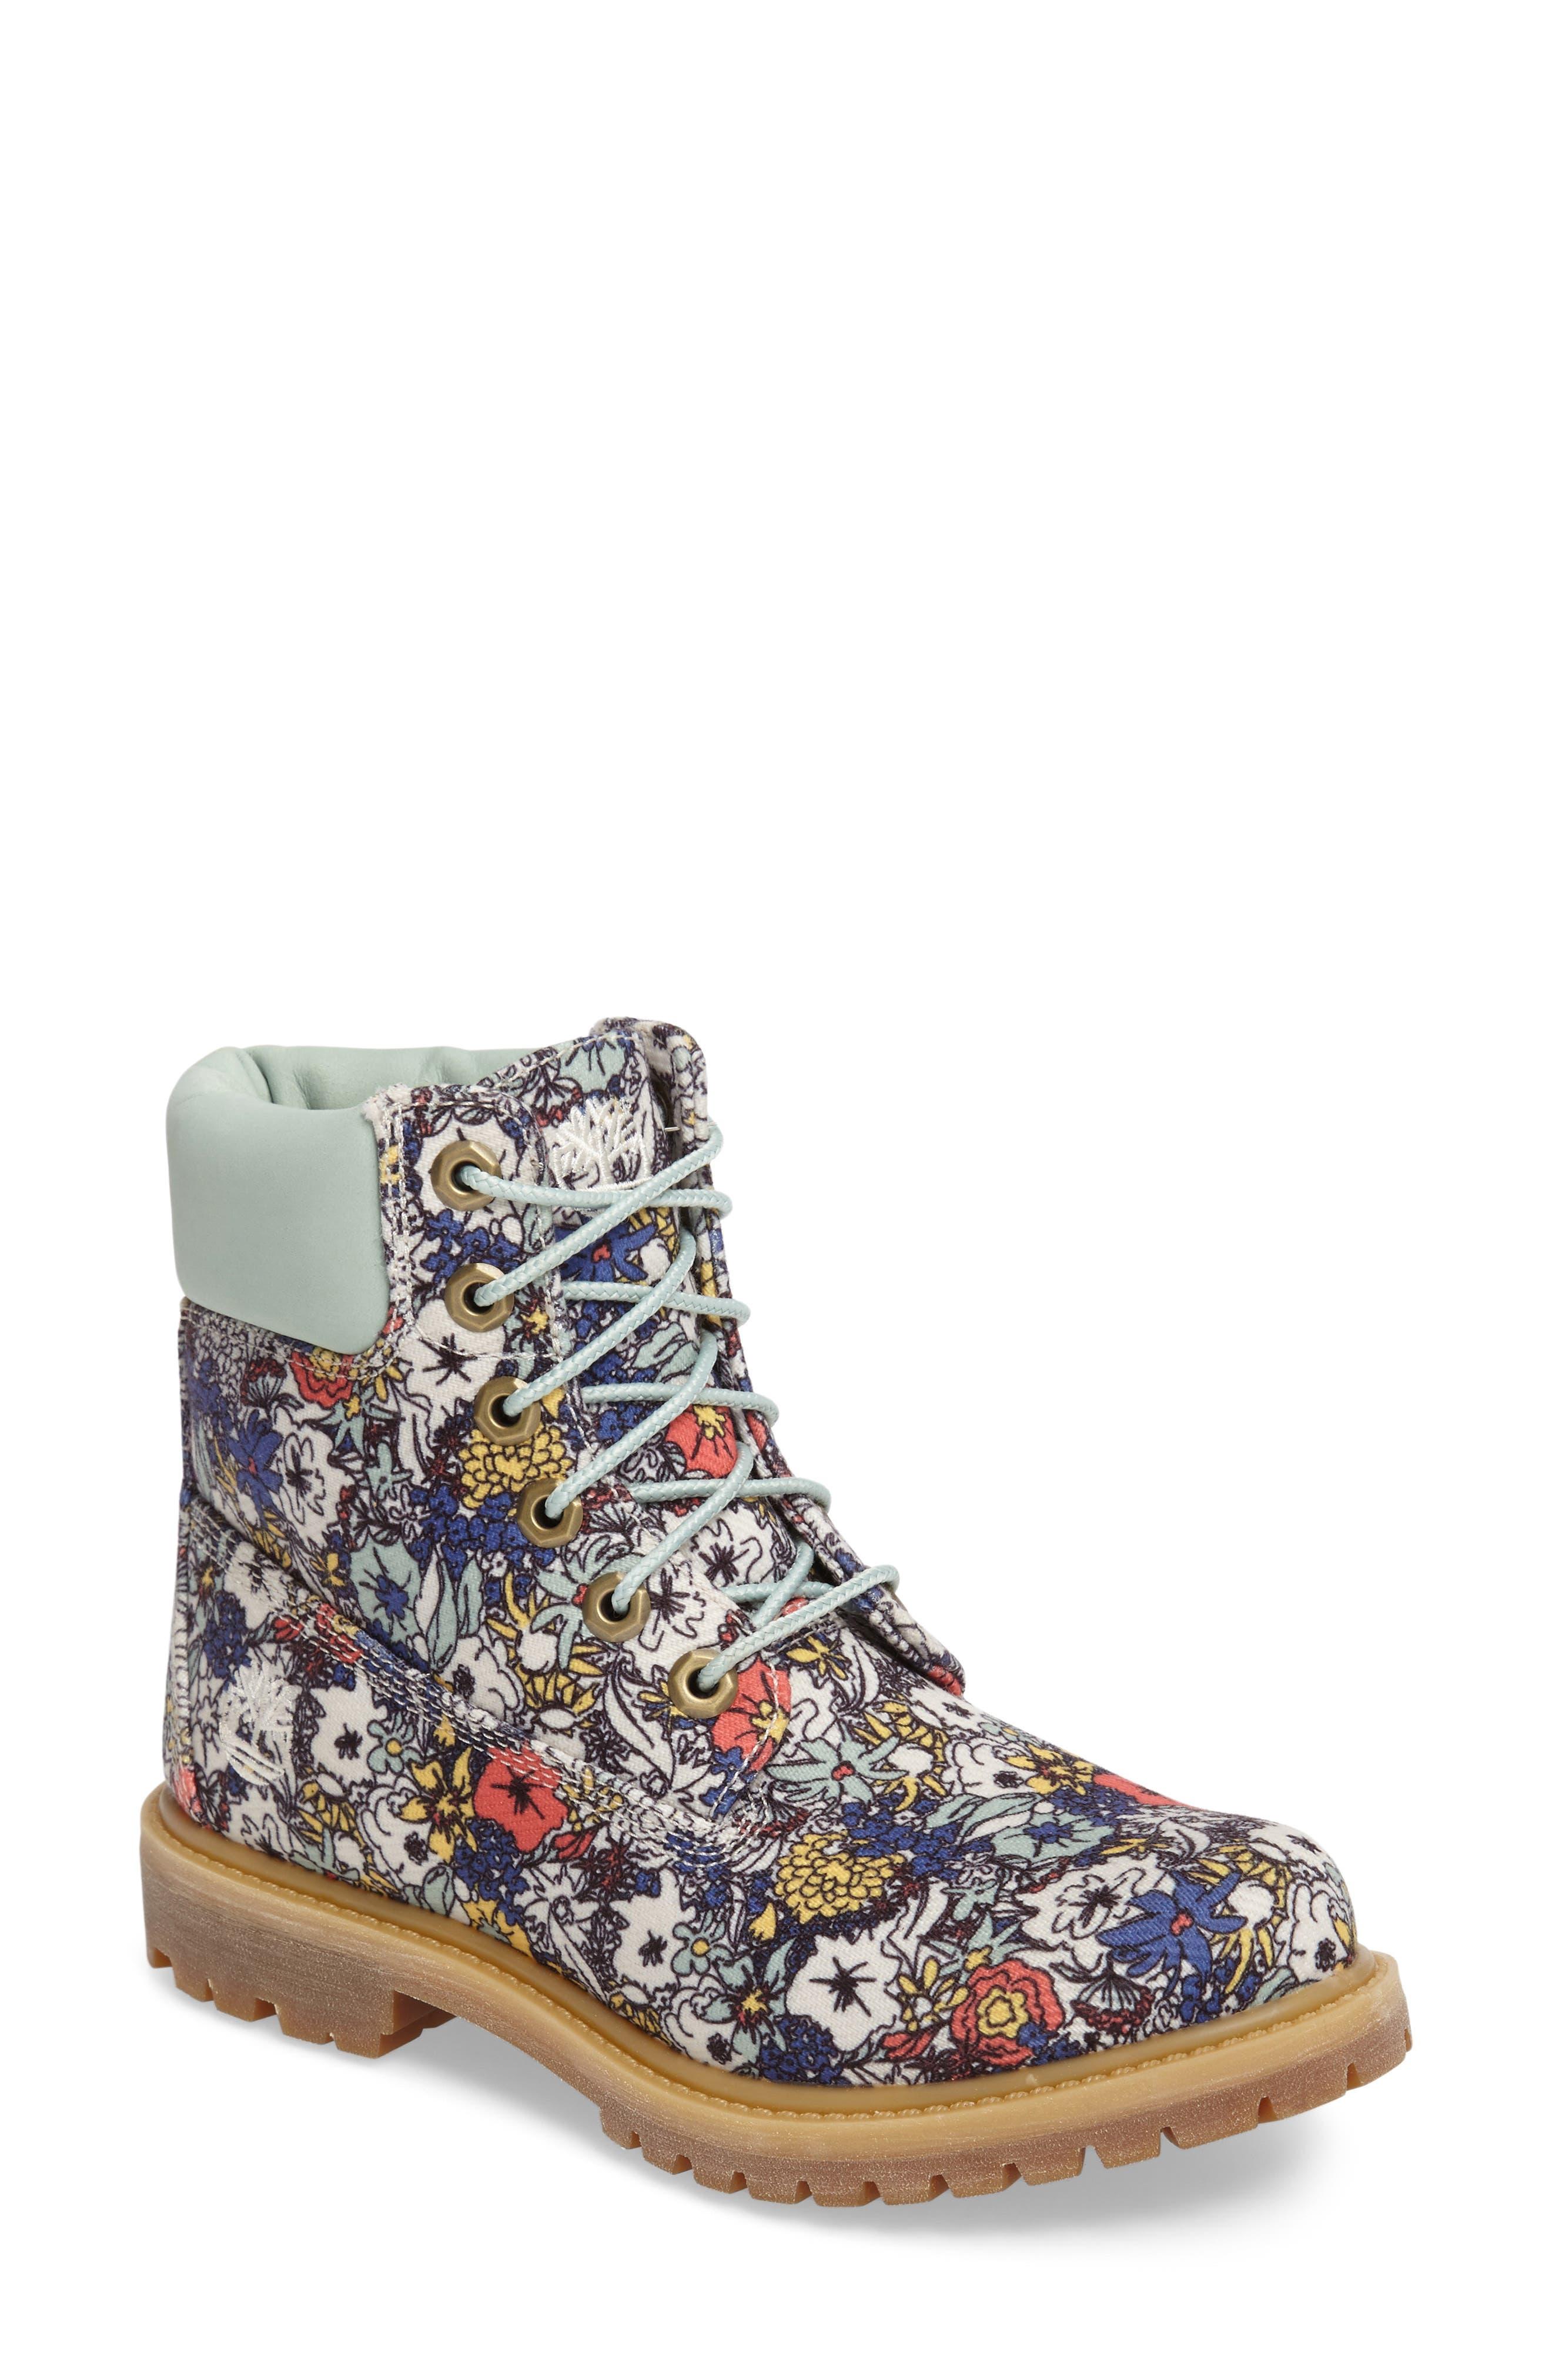 6 Inch Premium Floral Print Boot,                             Main thumbnail 1, color,                             400